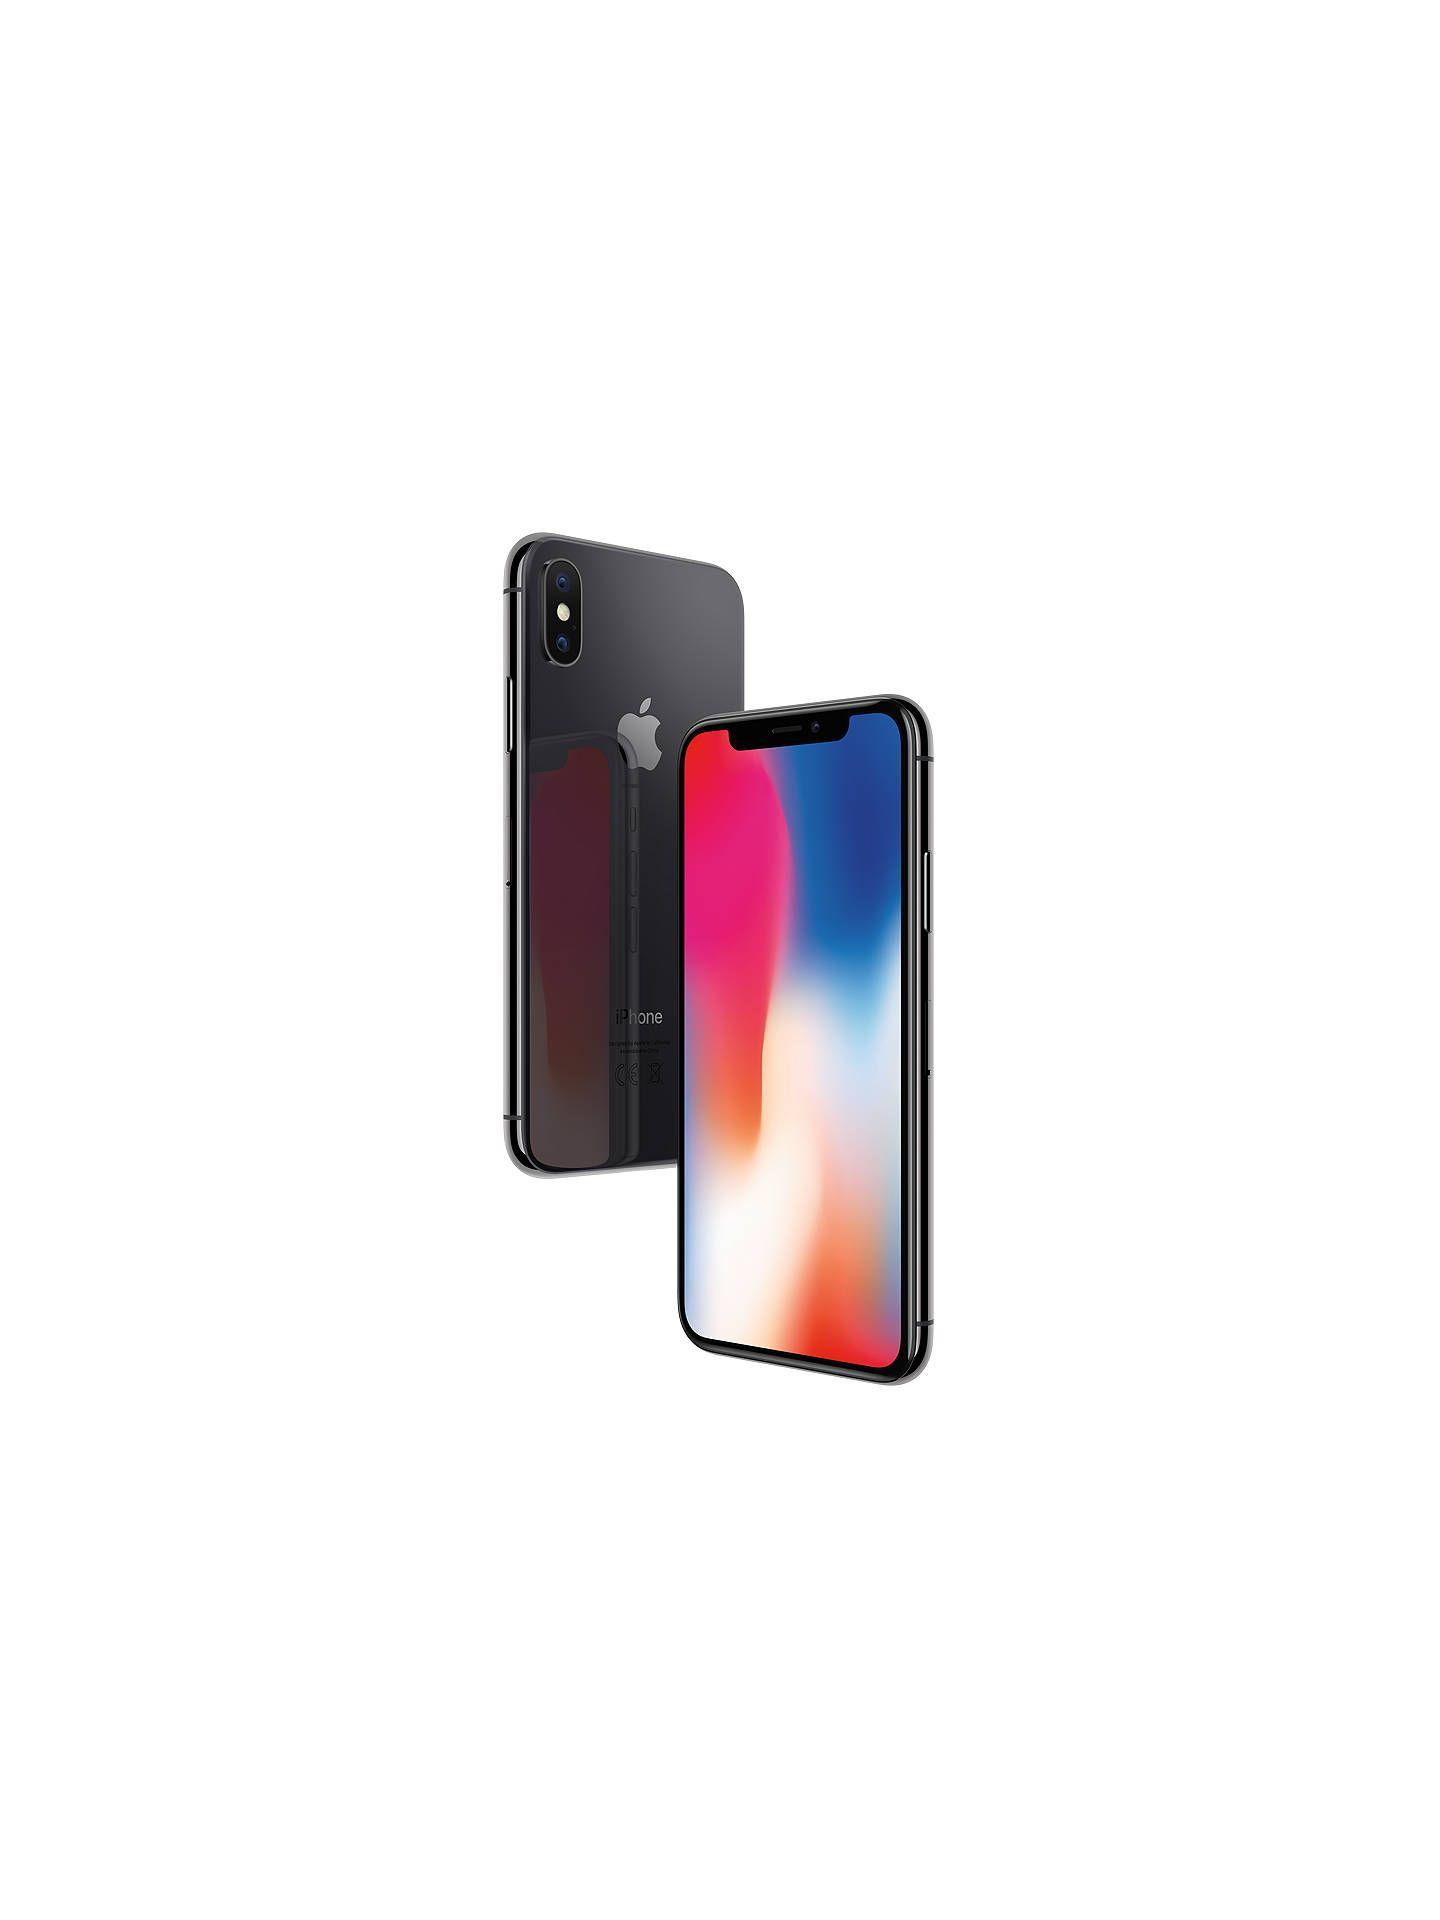 Apple iPhone X, iOS 11, 5 8